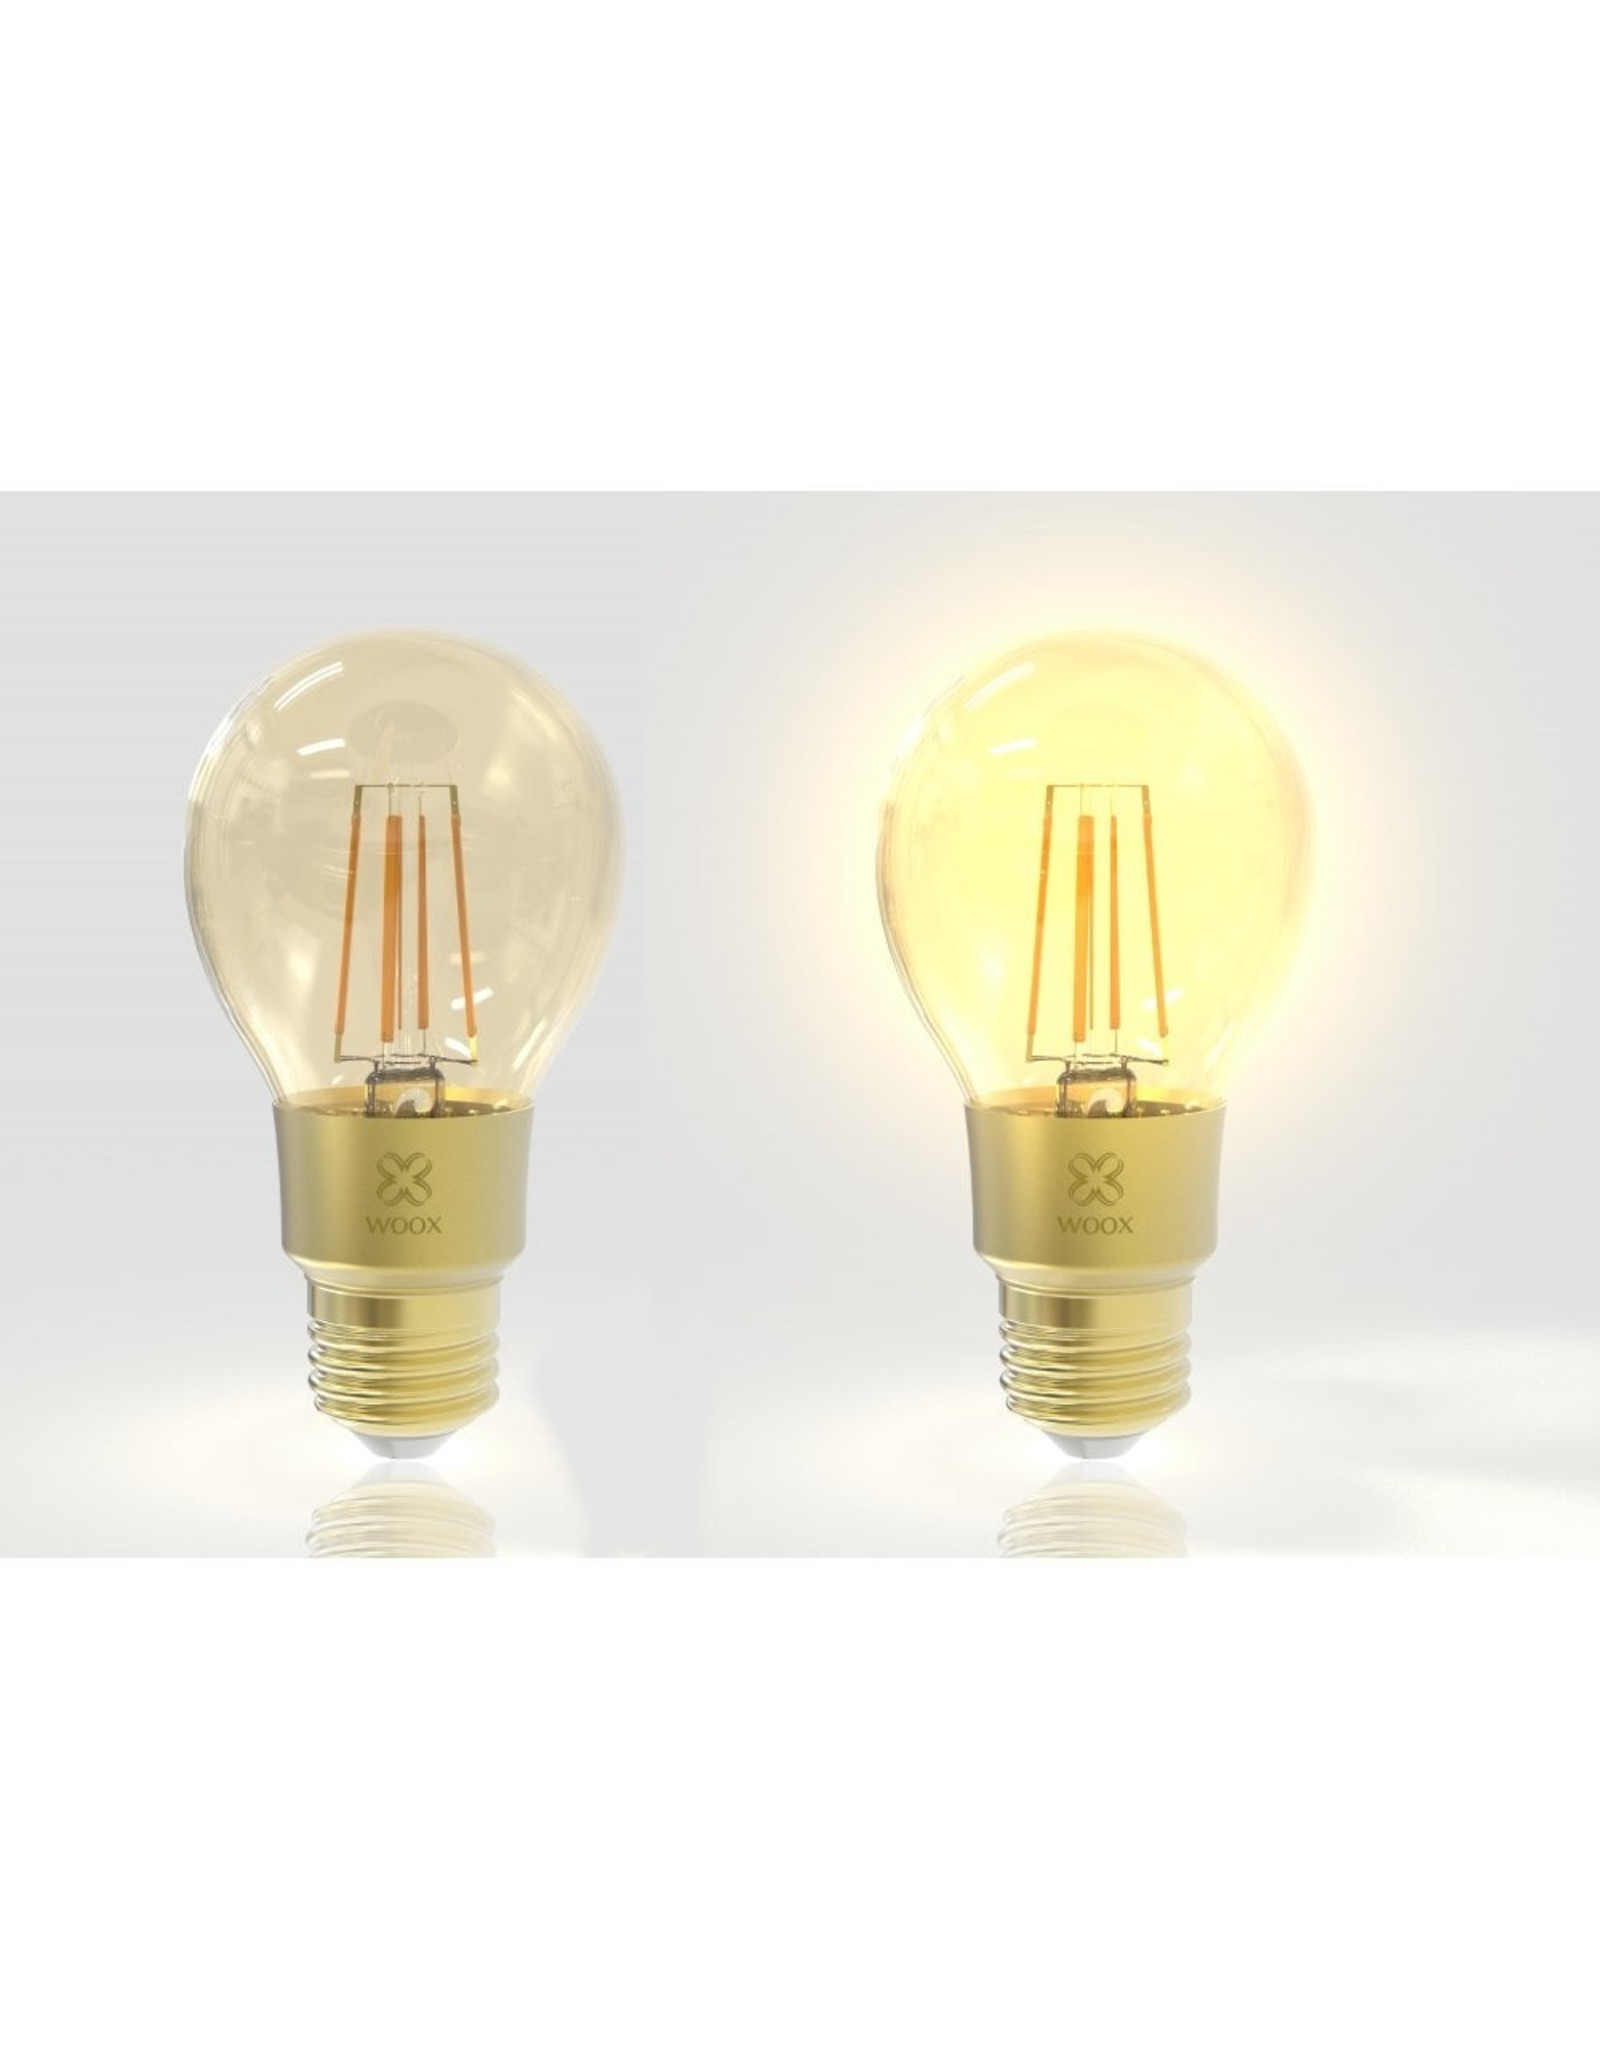 Woox Home Woox 3-Pack Smart Filament  Bulb   R9078